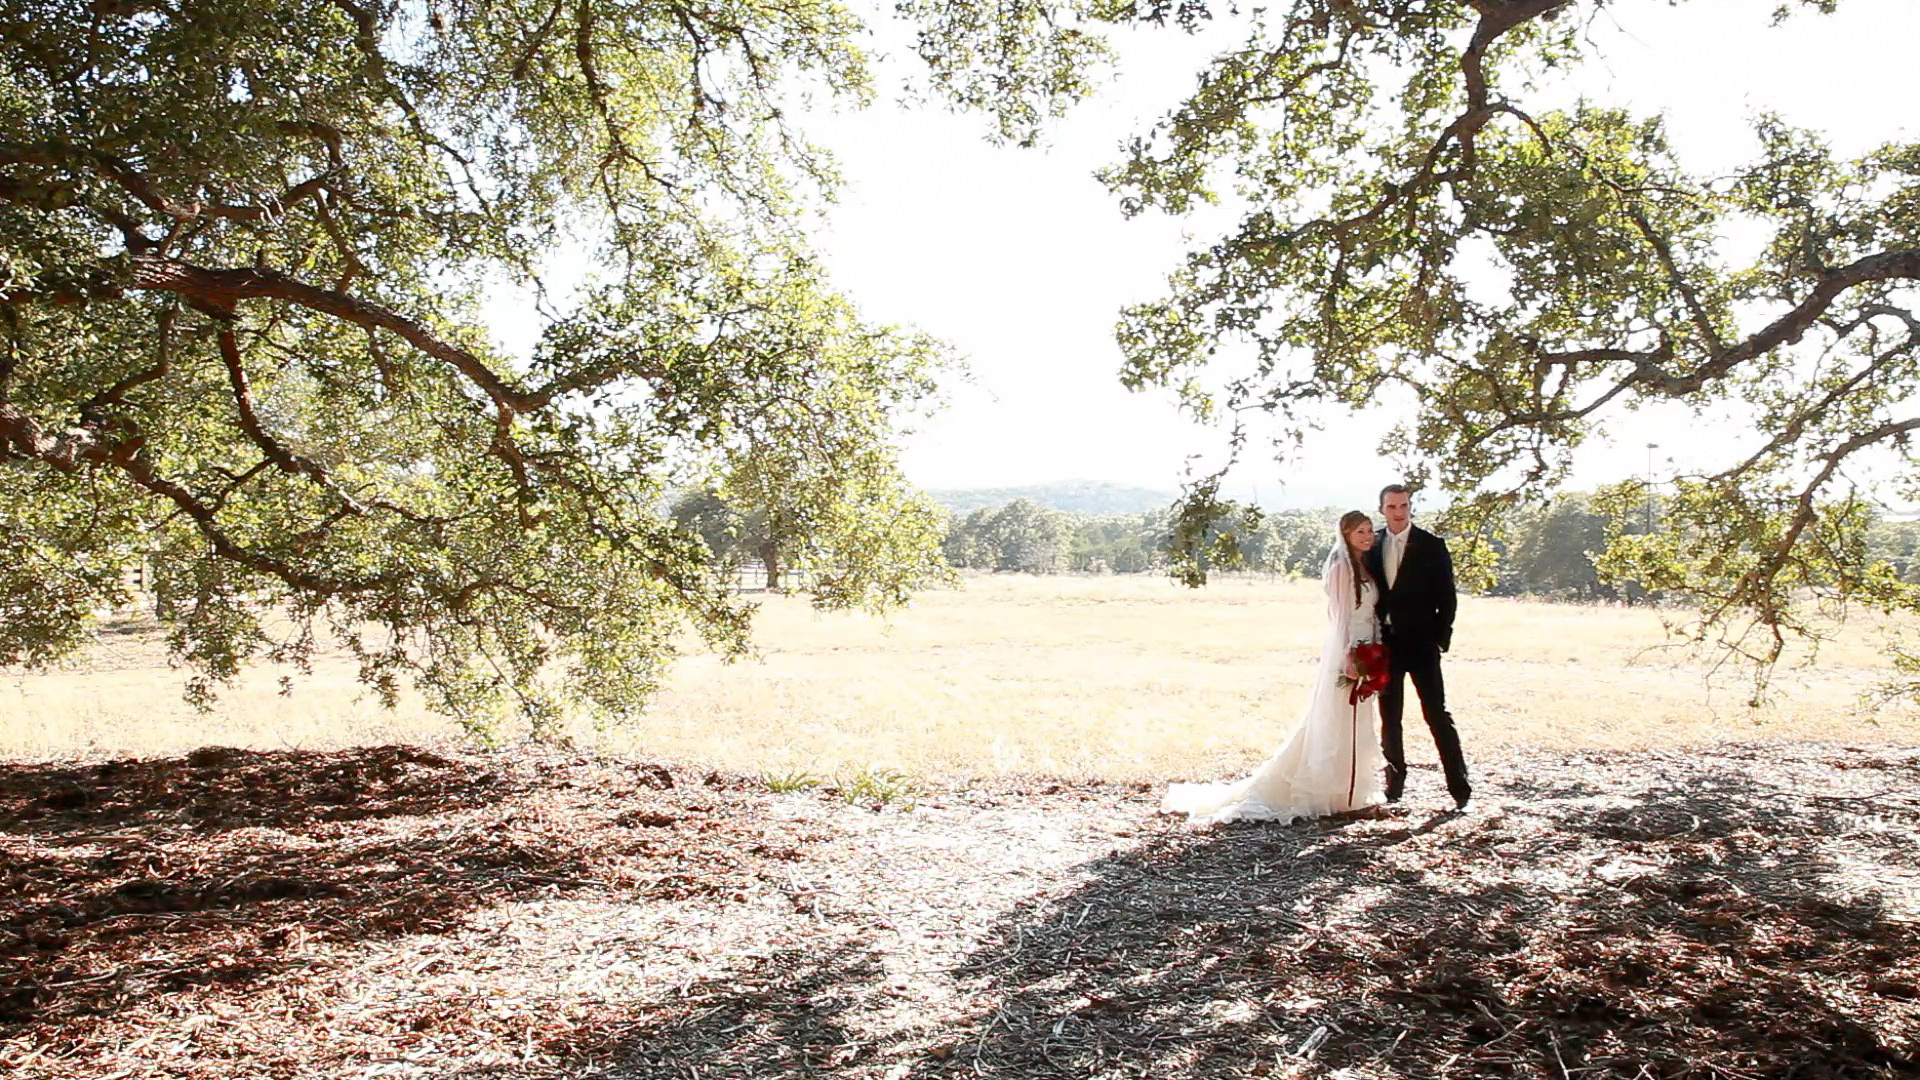 austinweddingvideography-8.jpg